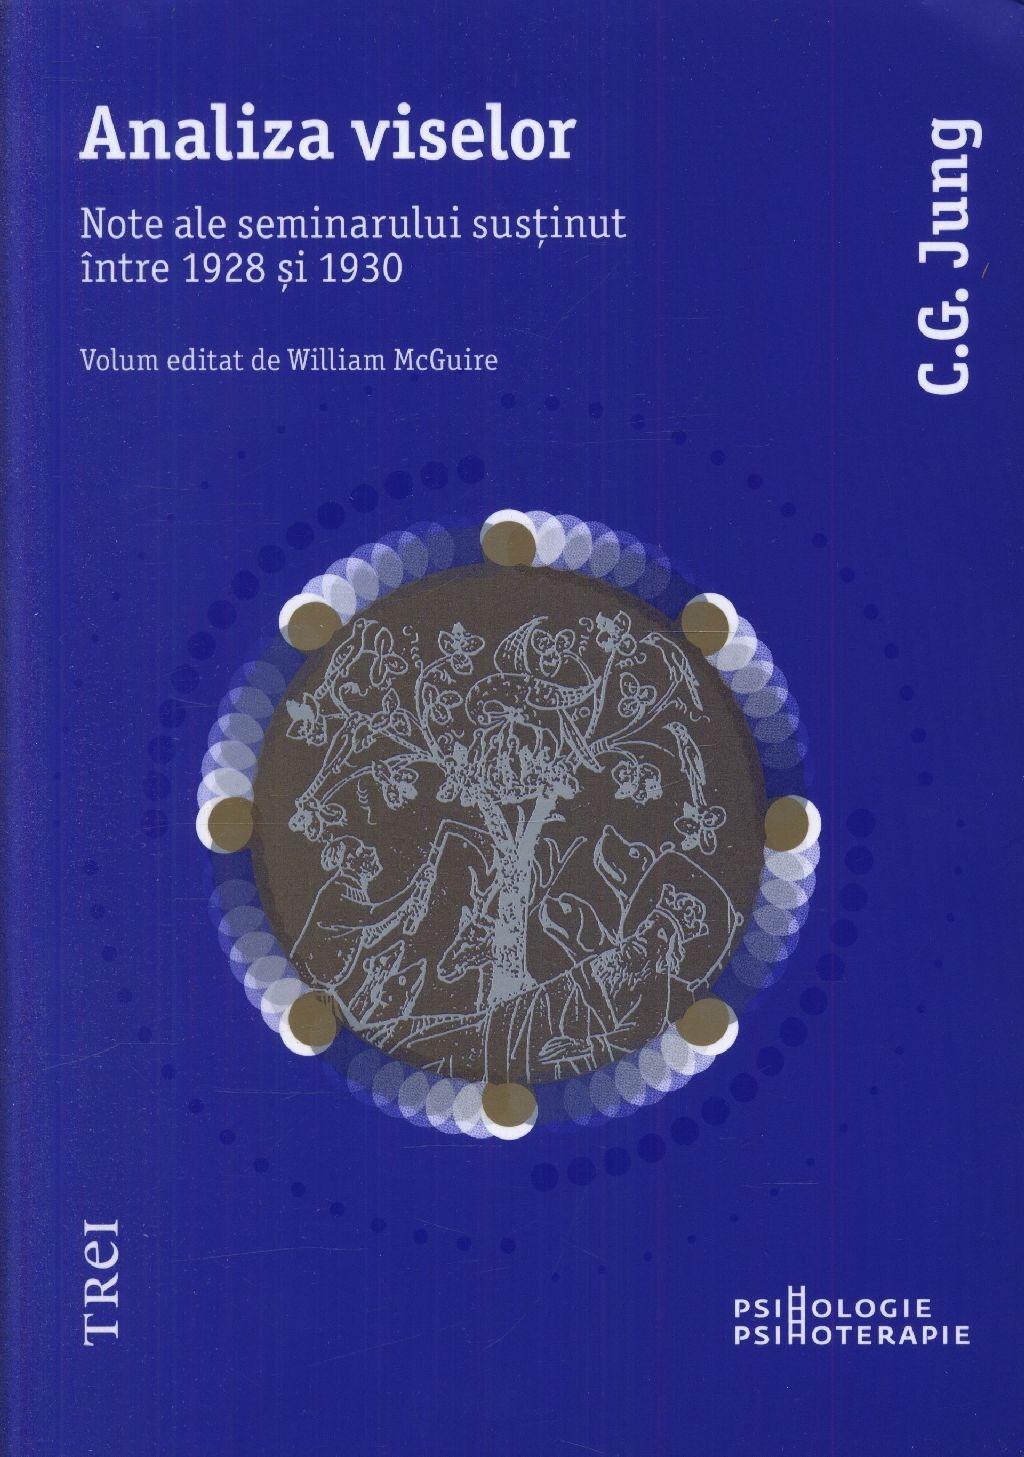 Analiza viselor. Note ale seminarului sustinut intre 1928 si 1930